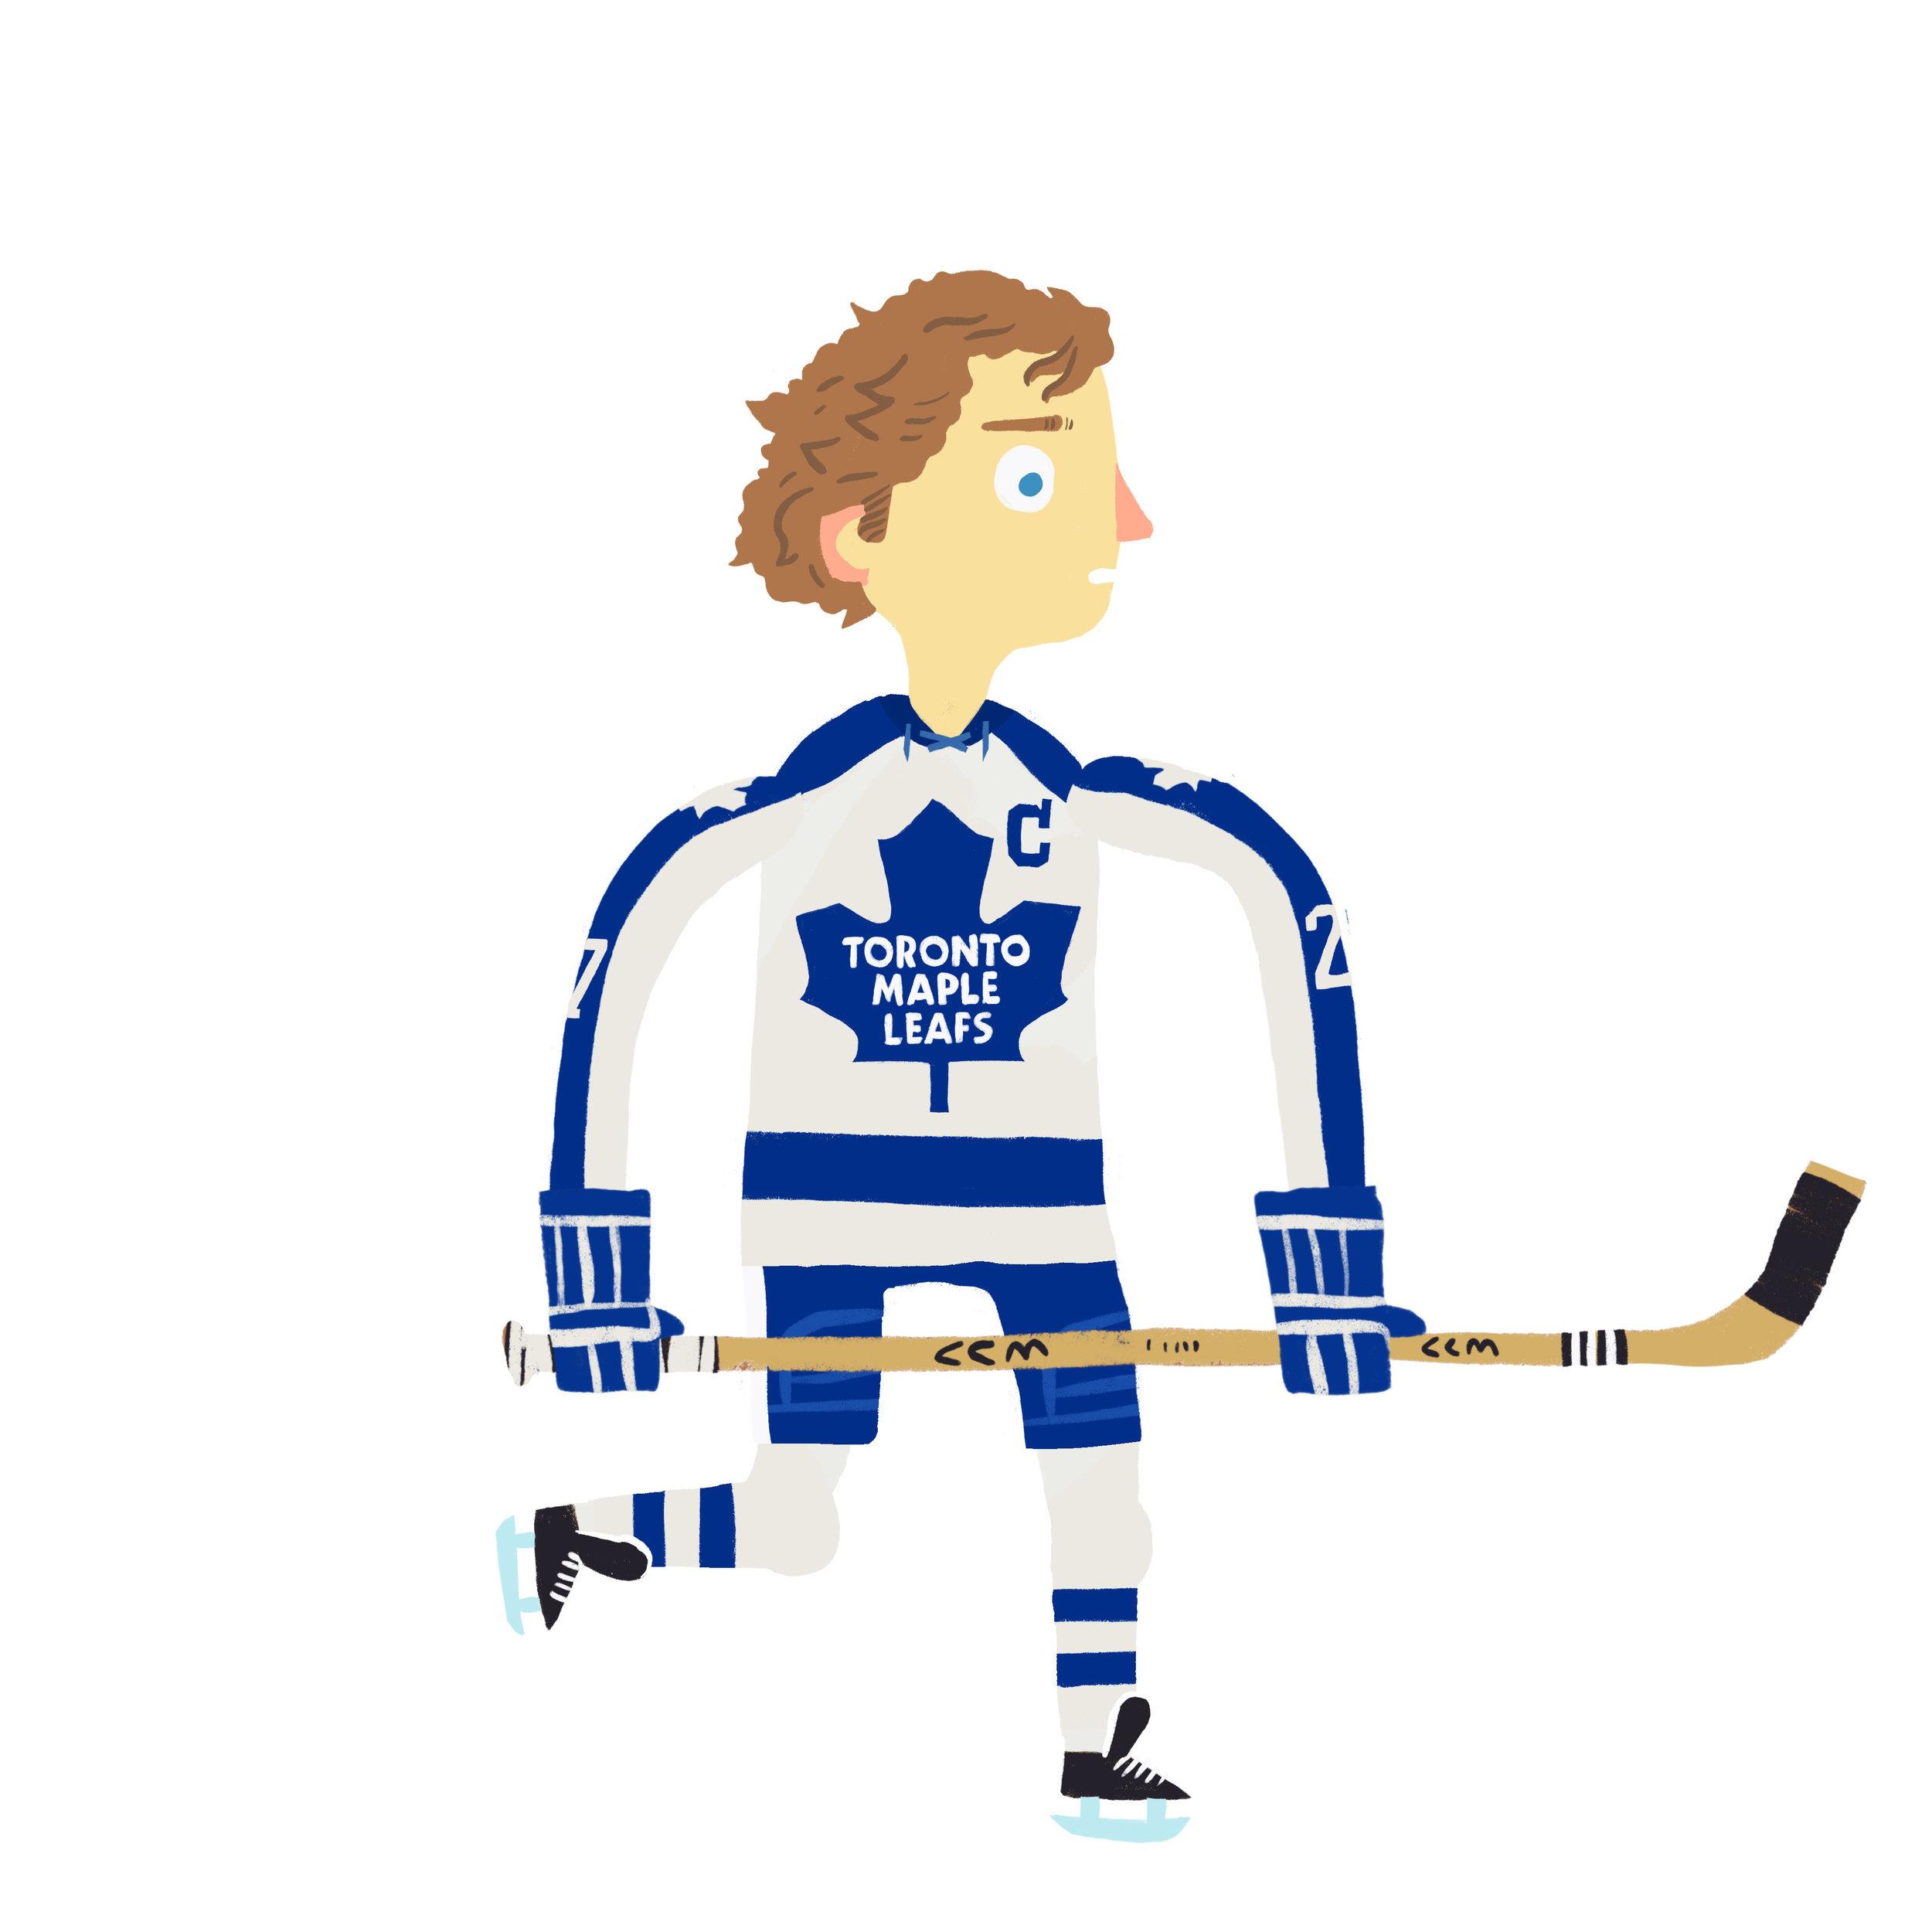 DARYL GLEN SITTLER, b. St. Jacobs, ON Toronto Maple Leafs (1970-82)